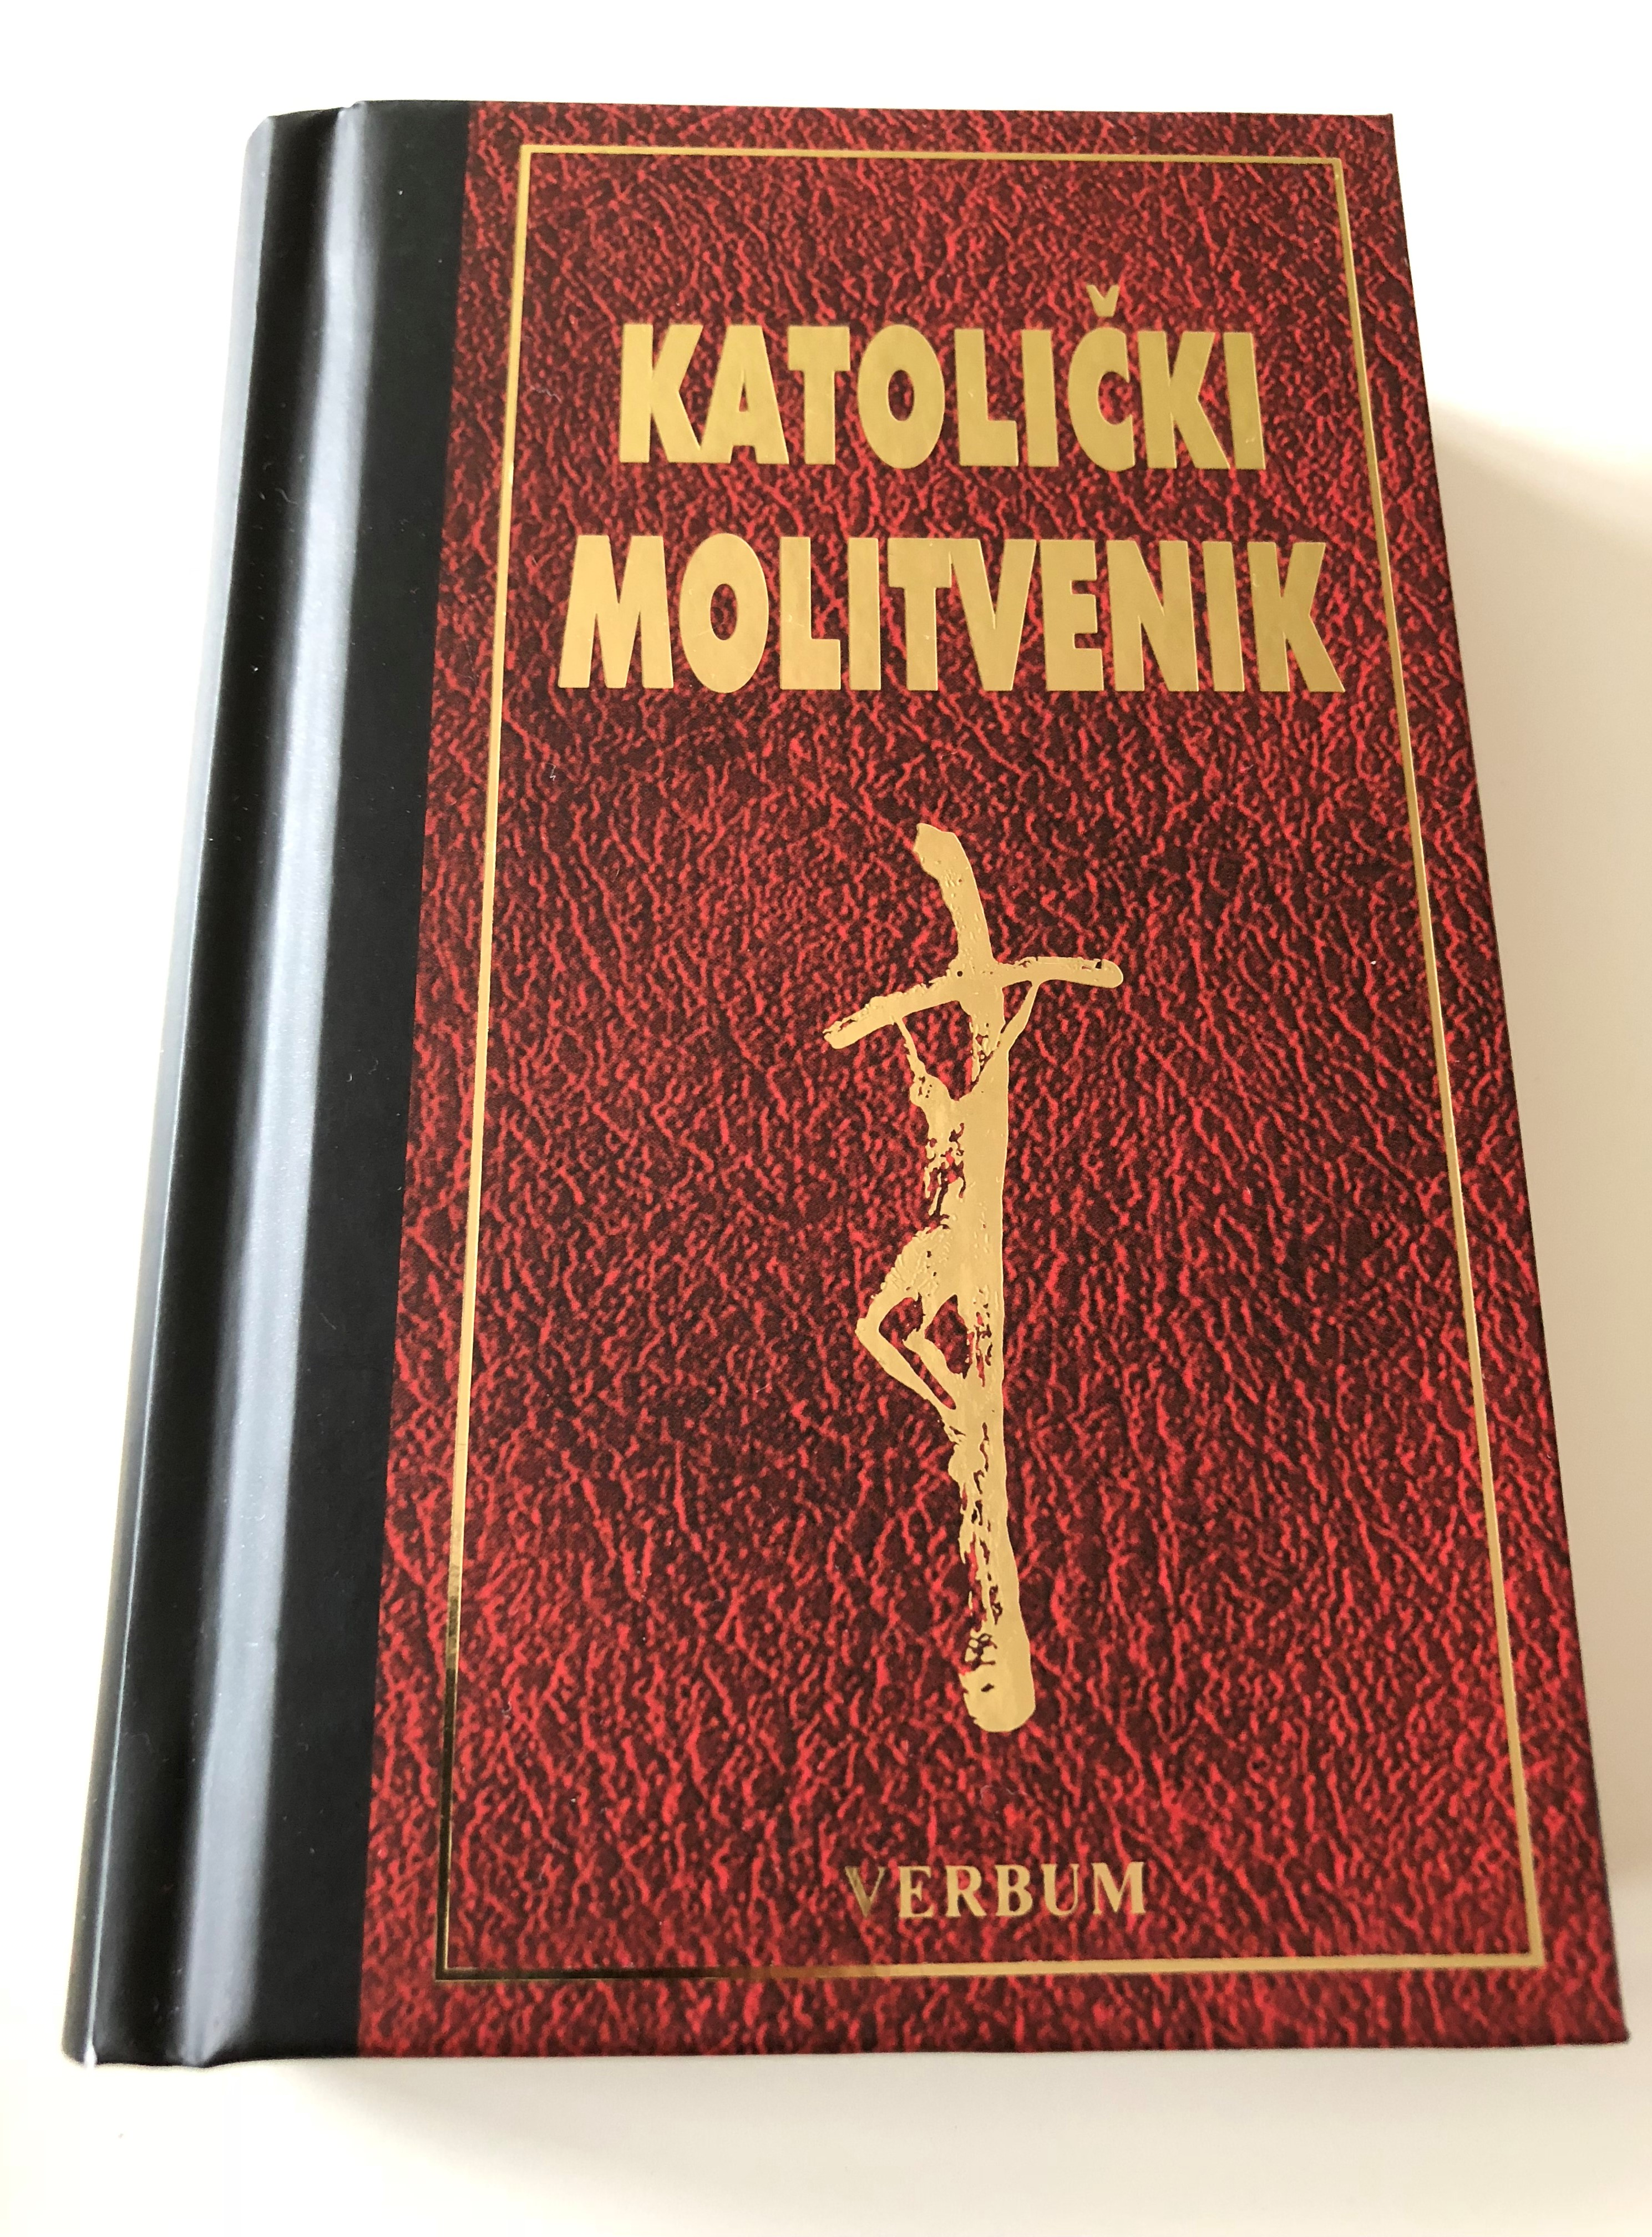 croatian-small-catholic-prayer-book-11th-edition-1-.jpg